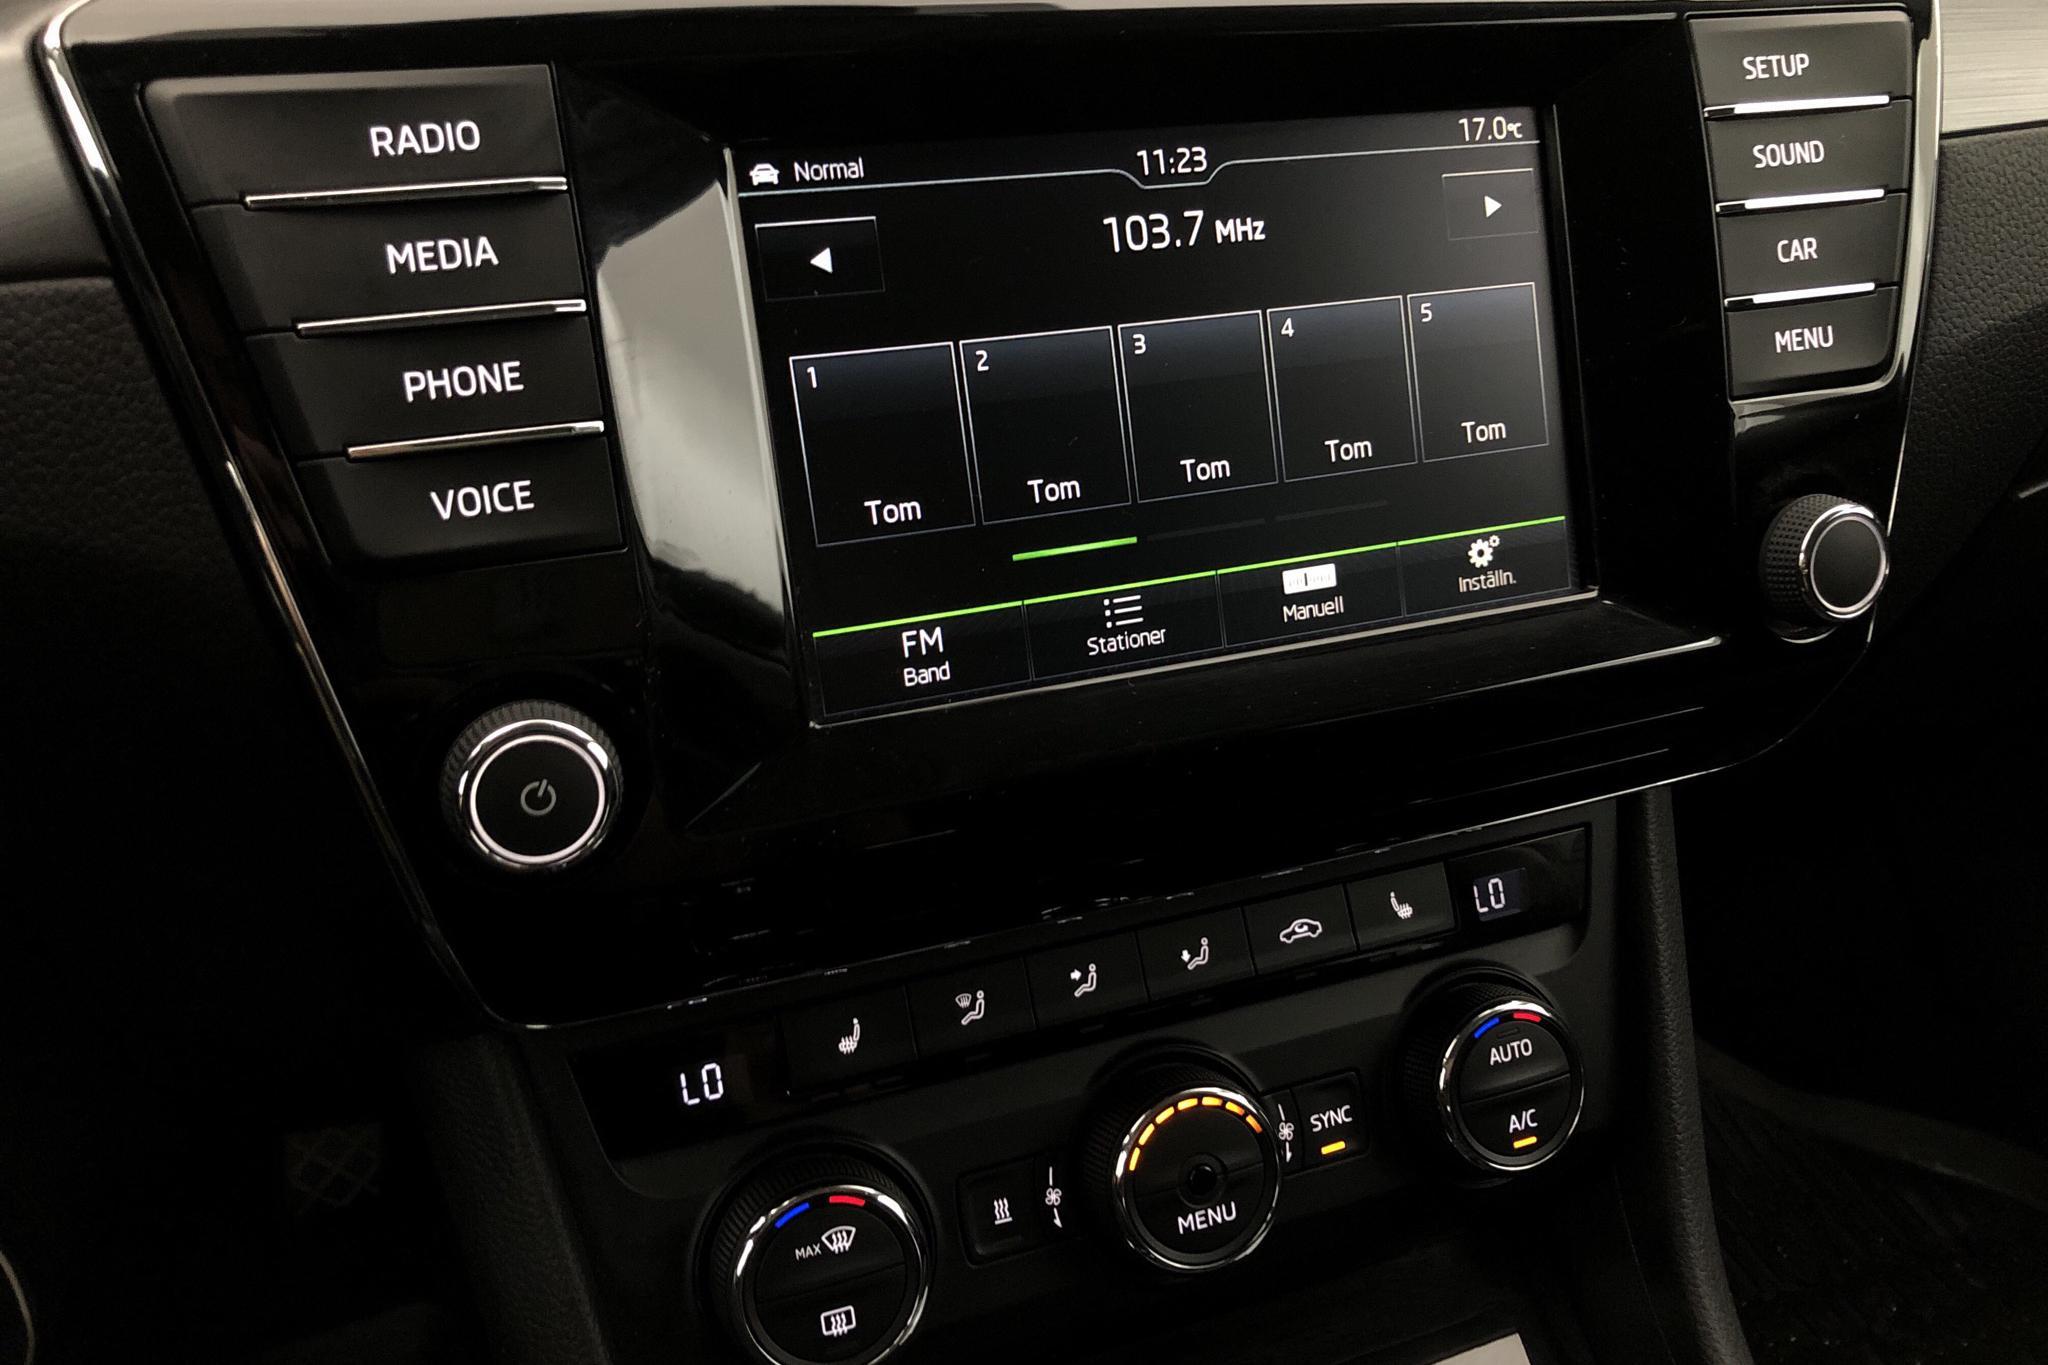 Skoda Superb 2.0 TDI 4x4 Kombi (190hk) - 114 490 km - Automatic - white - 2016